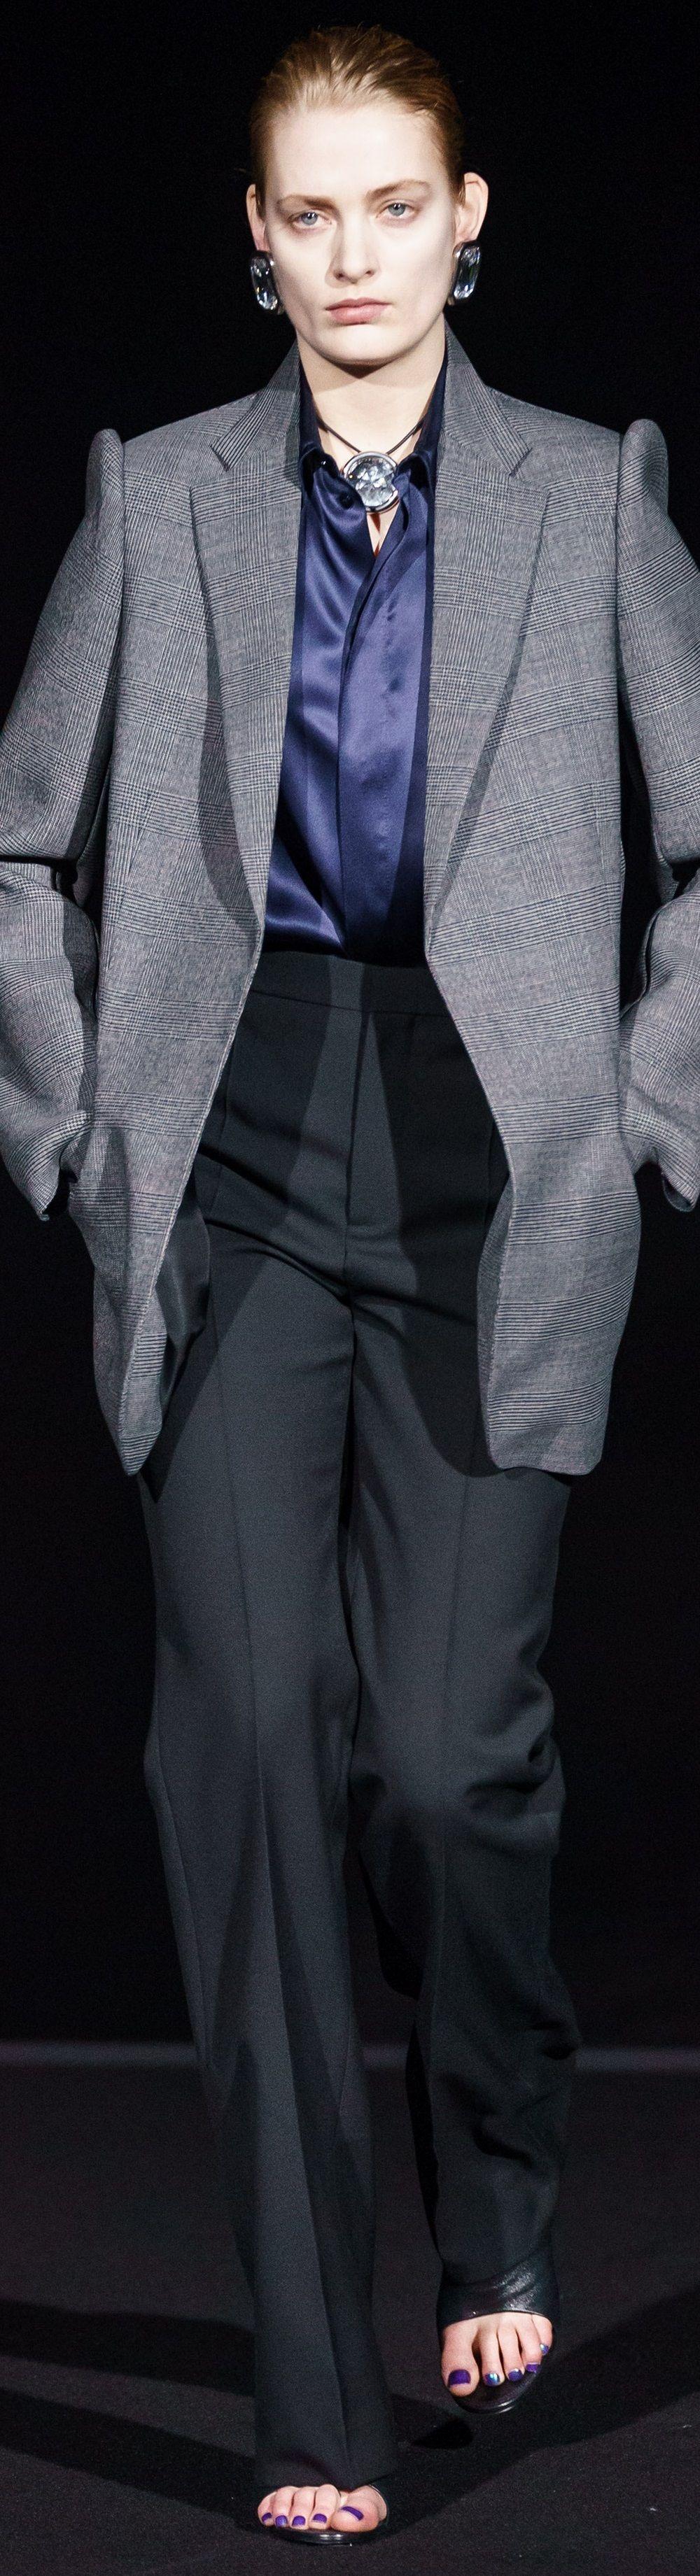 Balenciaga Fall RTW 2019 in 2020 Work fashion, Fashion